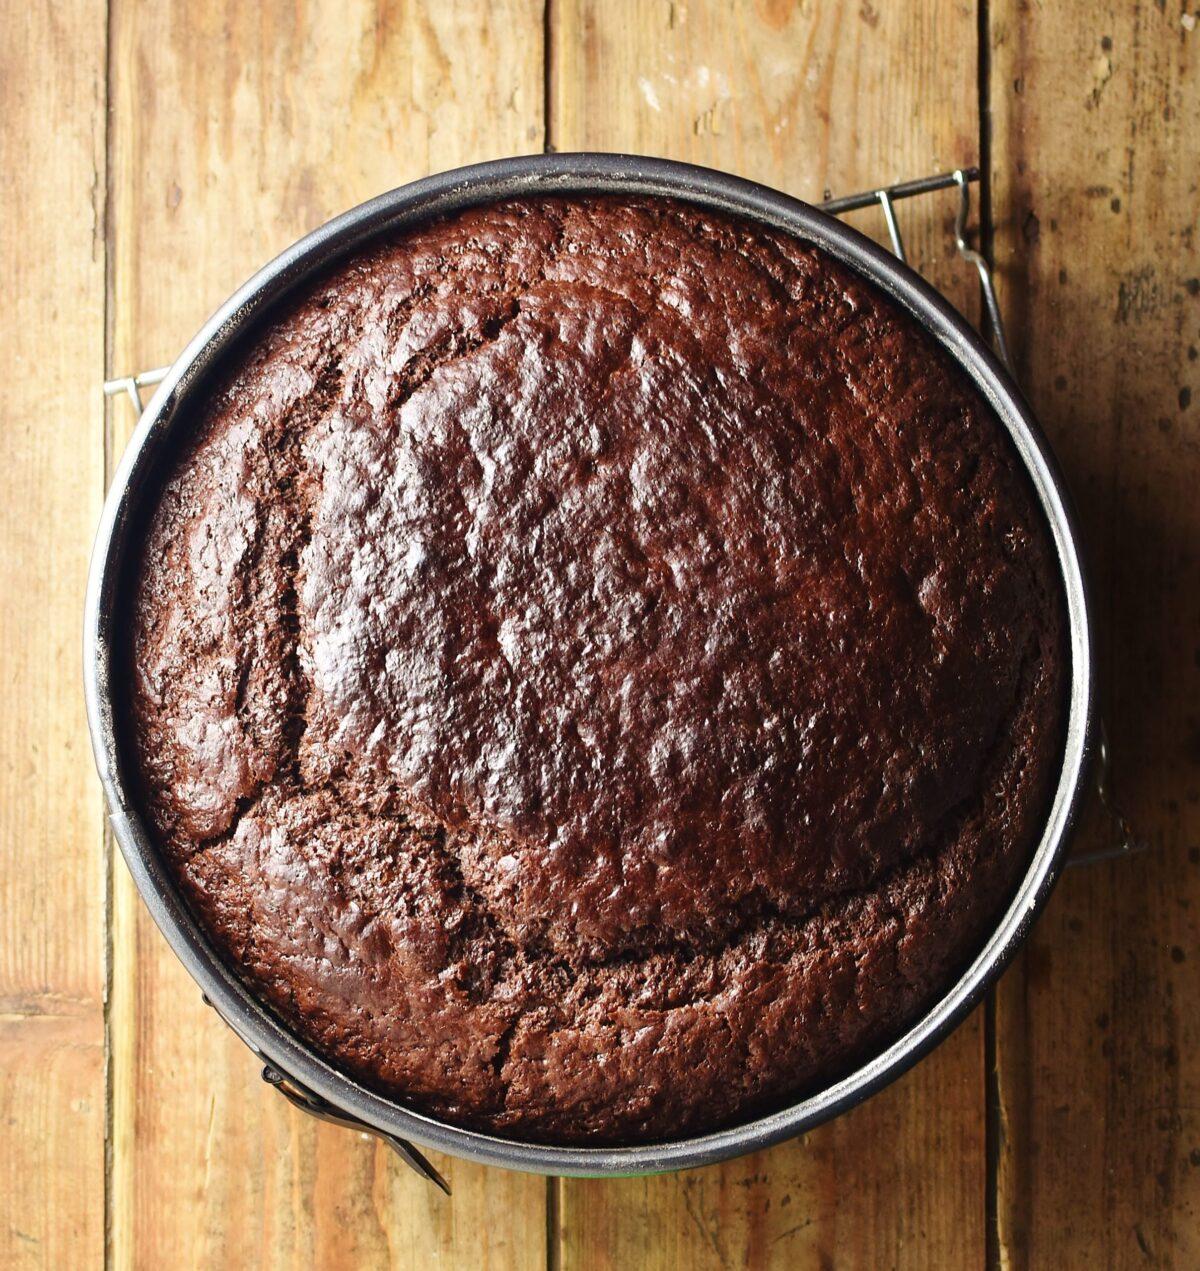 Baked banana chocolate cake in round pan.